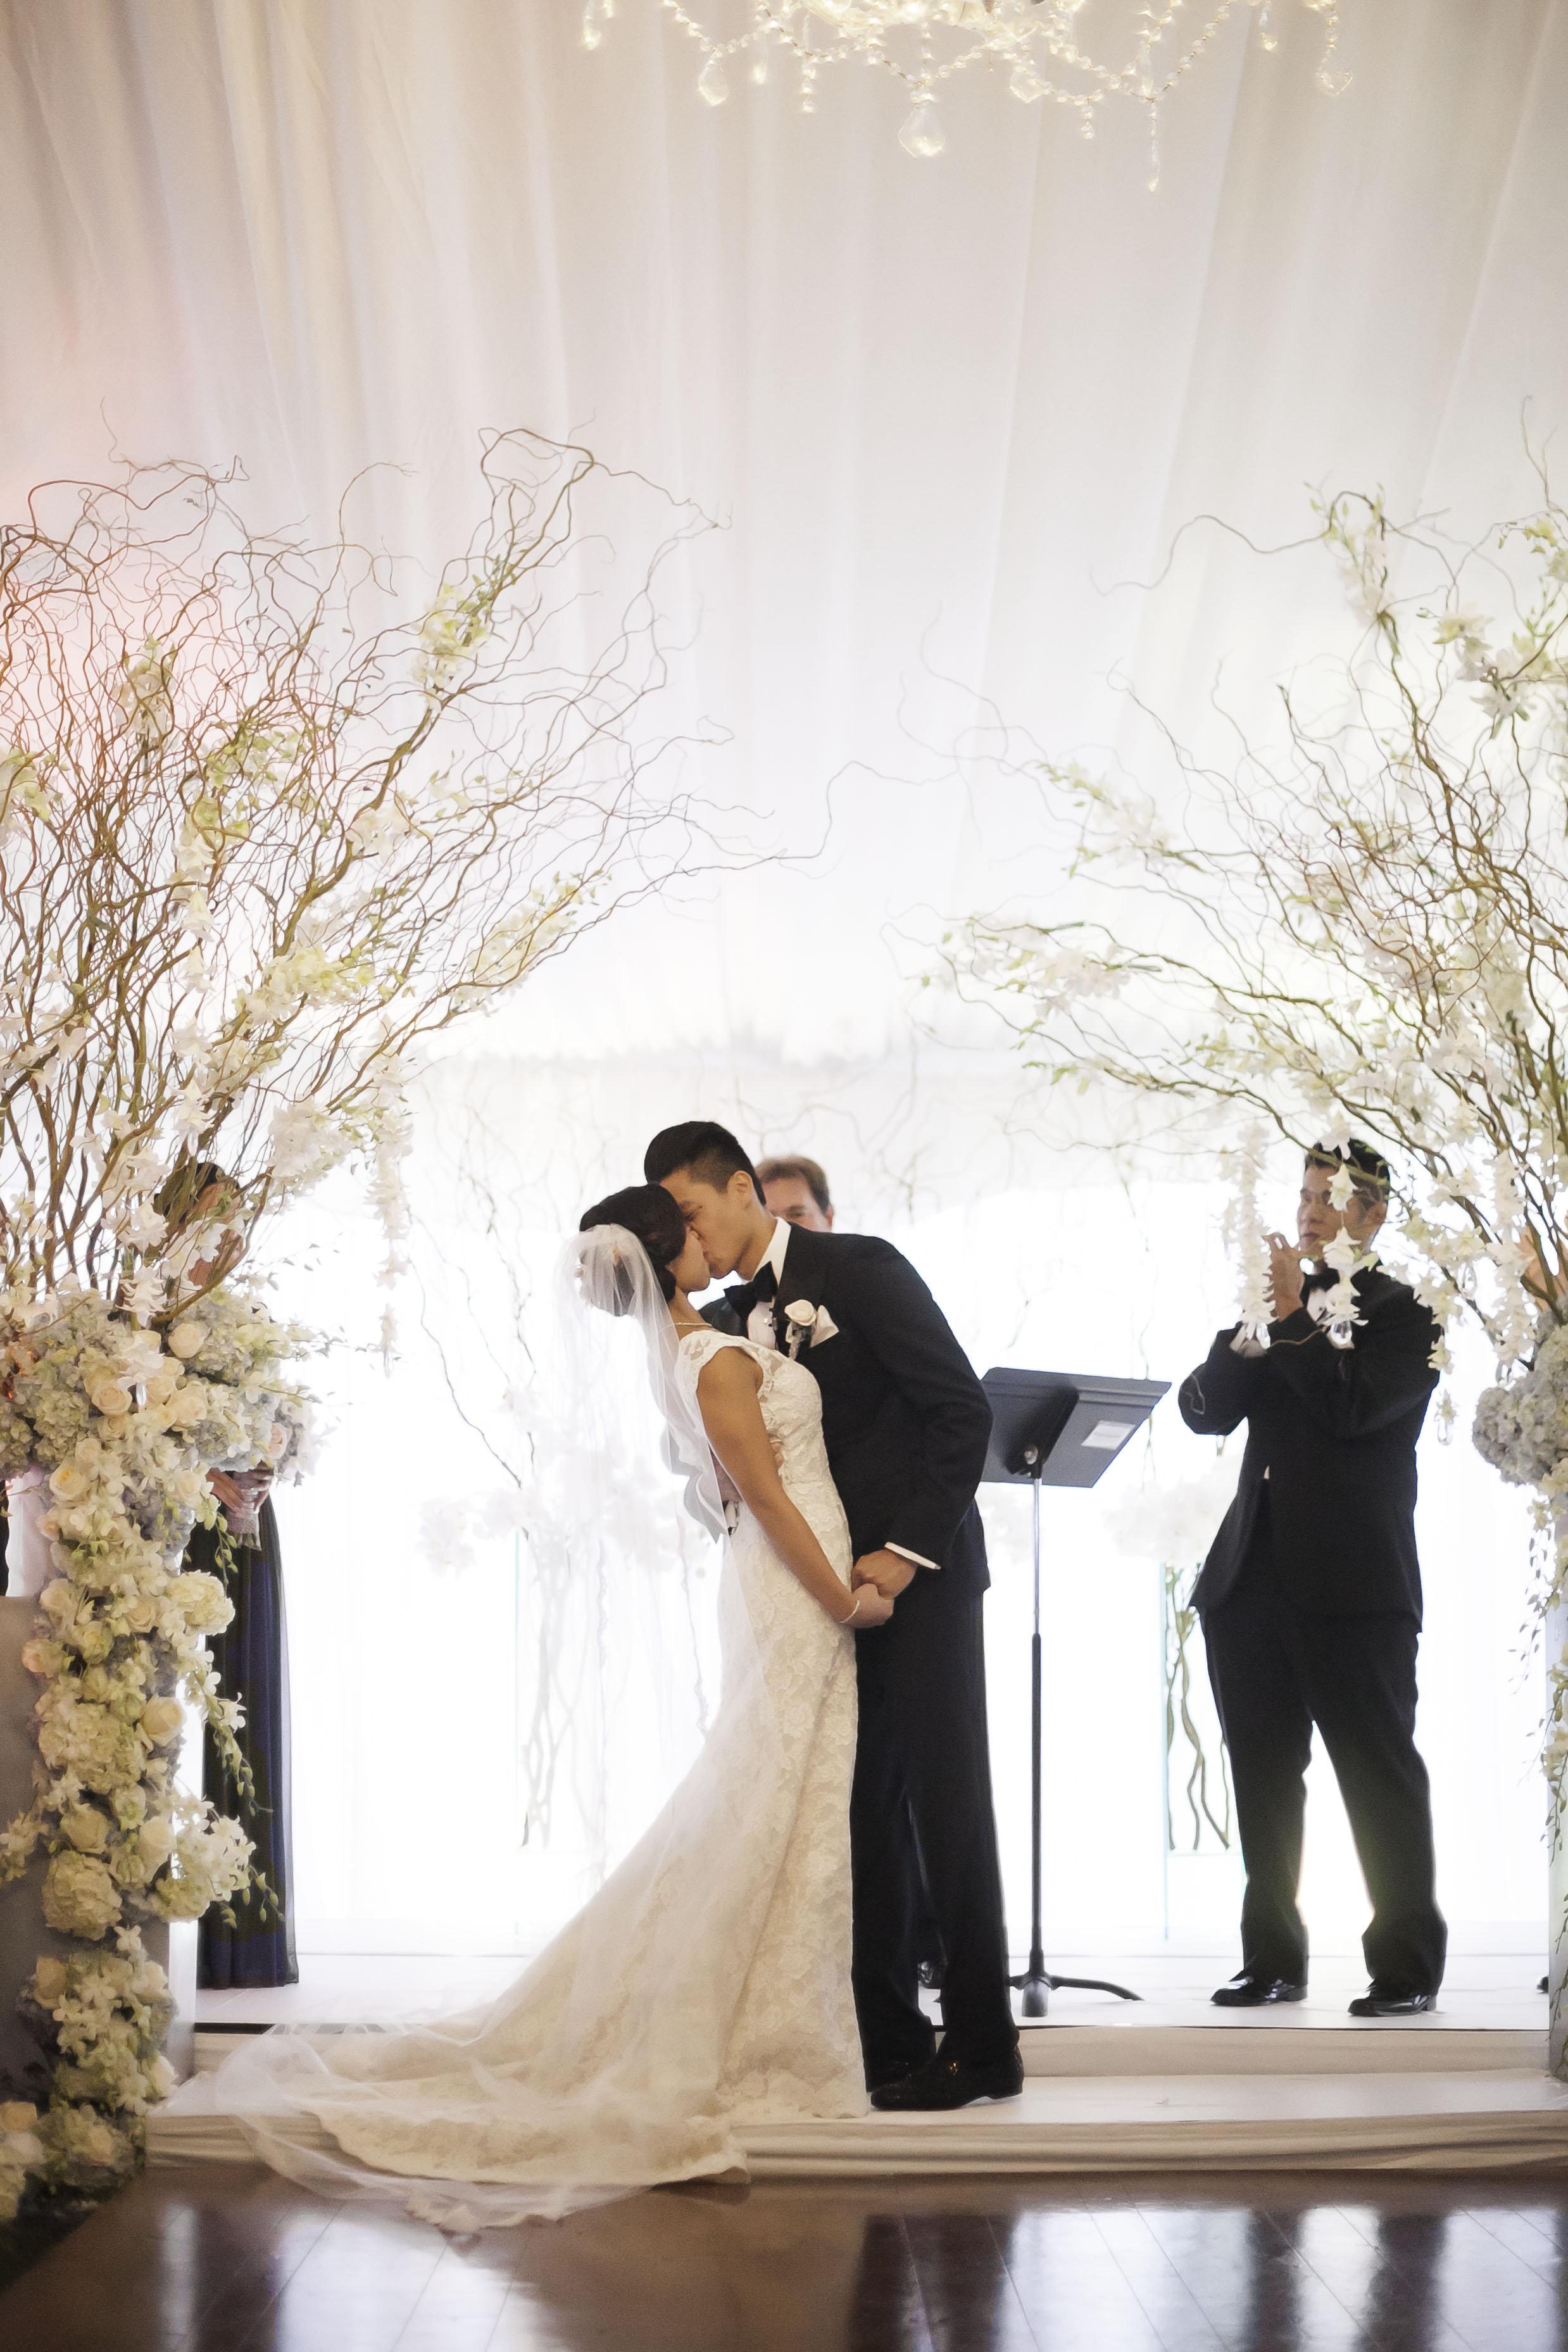 Courtney Calvin s Wedding 10 8 14-1court and cal wedding day-0637.jpg